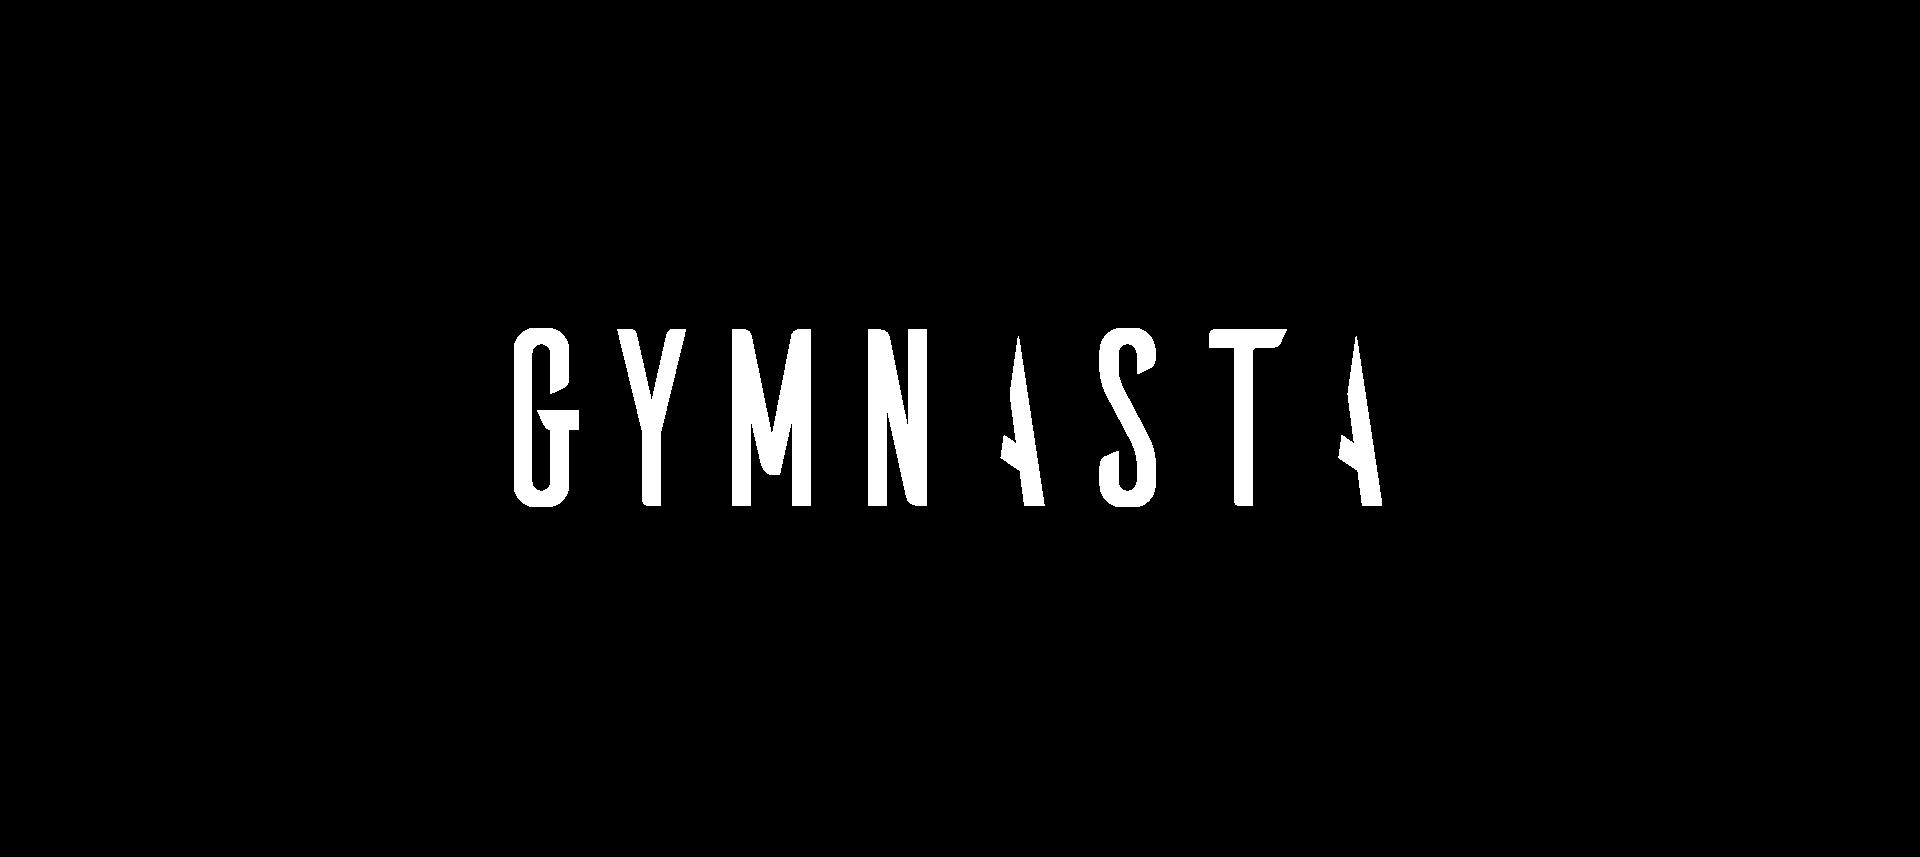 Gymnasta